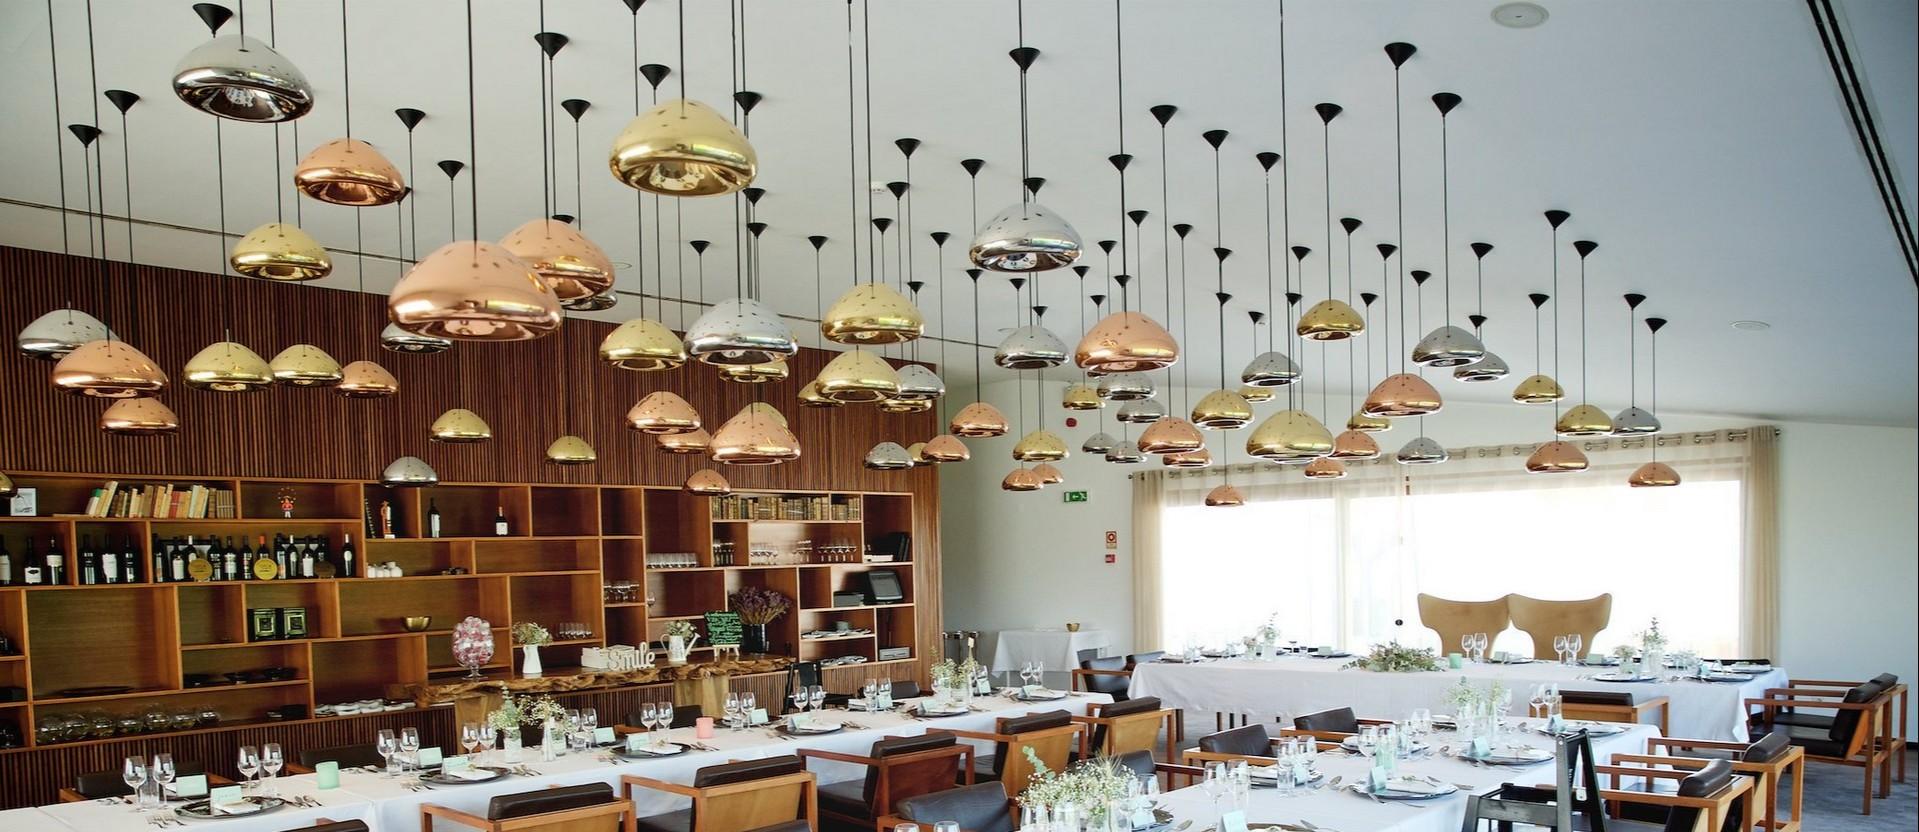 Michelin star restaurants: L'And michelin star restaurants Michelin star restaurants: The complete guide for 2019 Michelin star restaurants 6